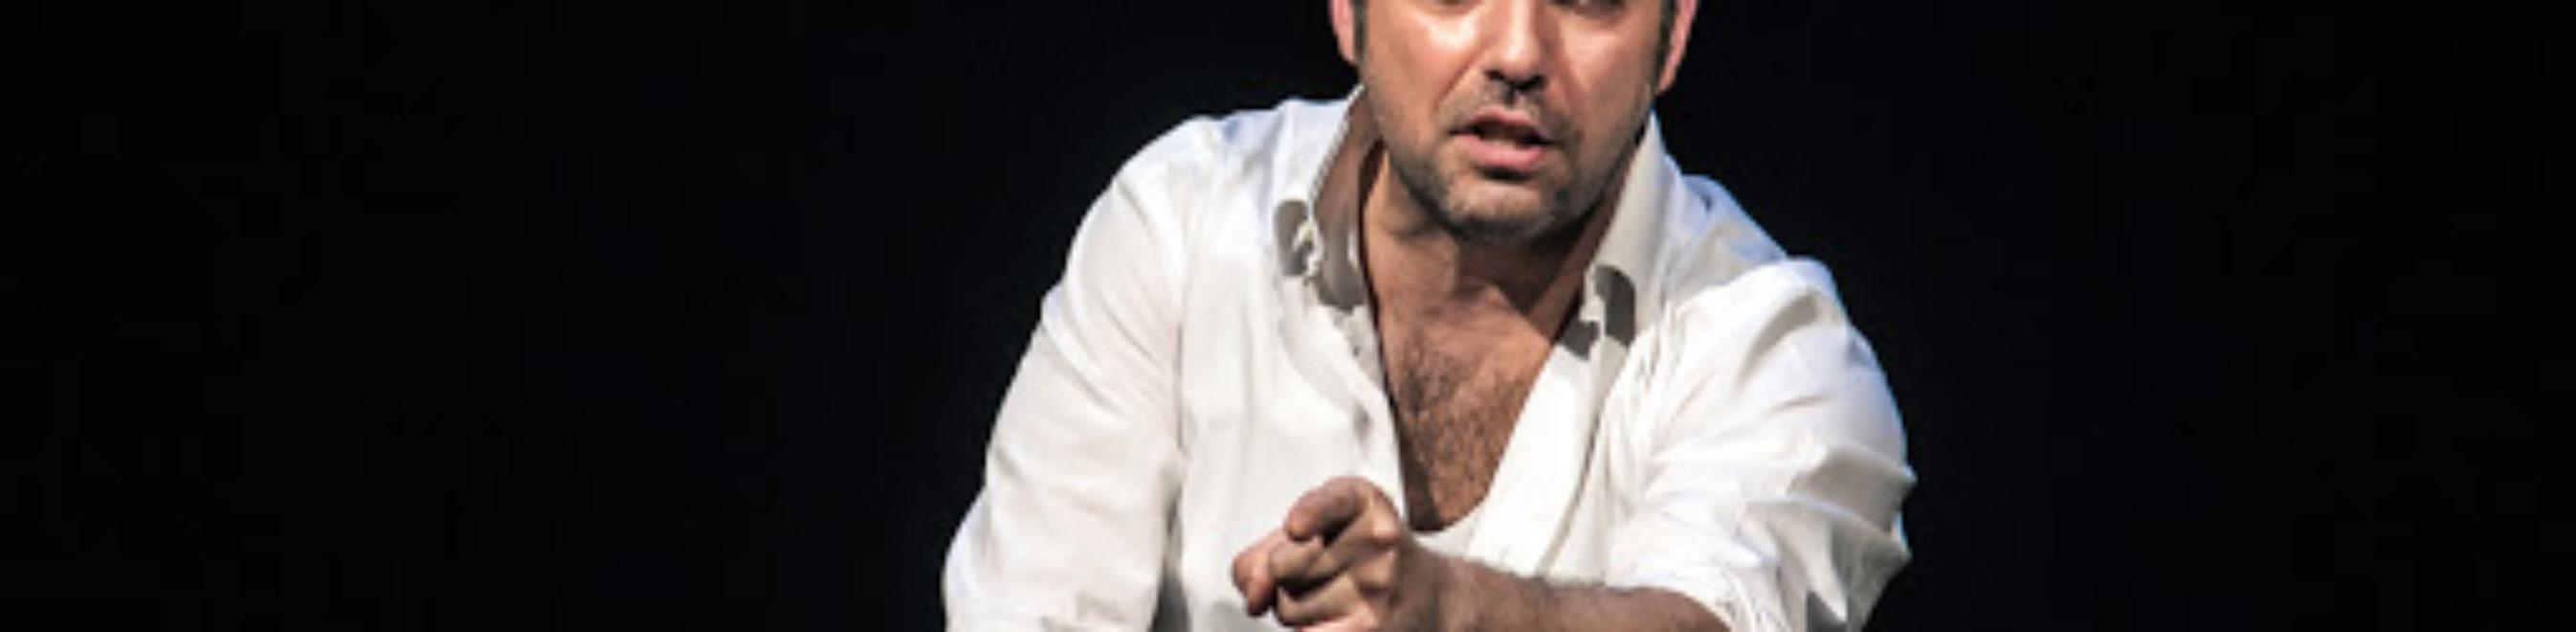 25/09- SdQ: LA TURNÀTA con Mario Perrotta